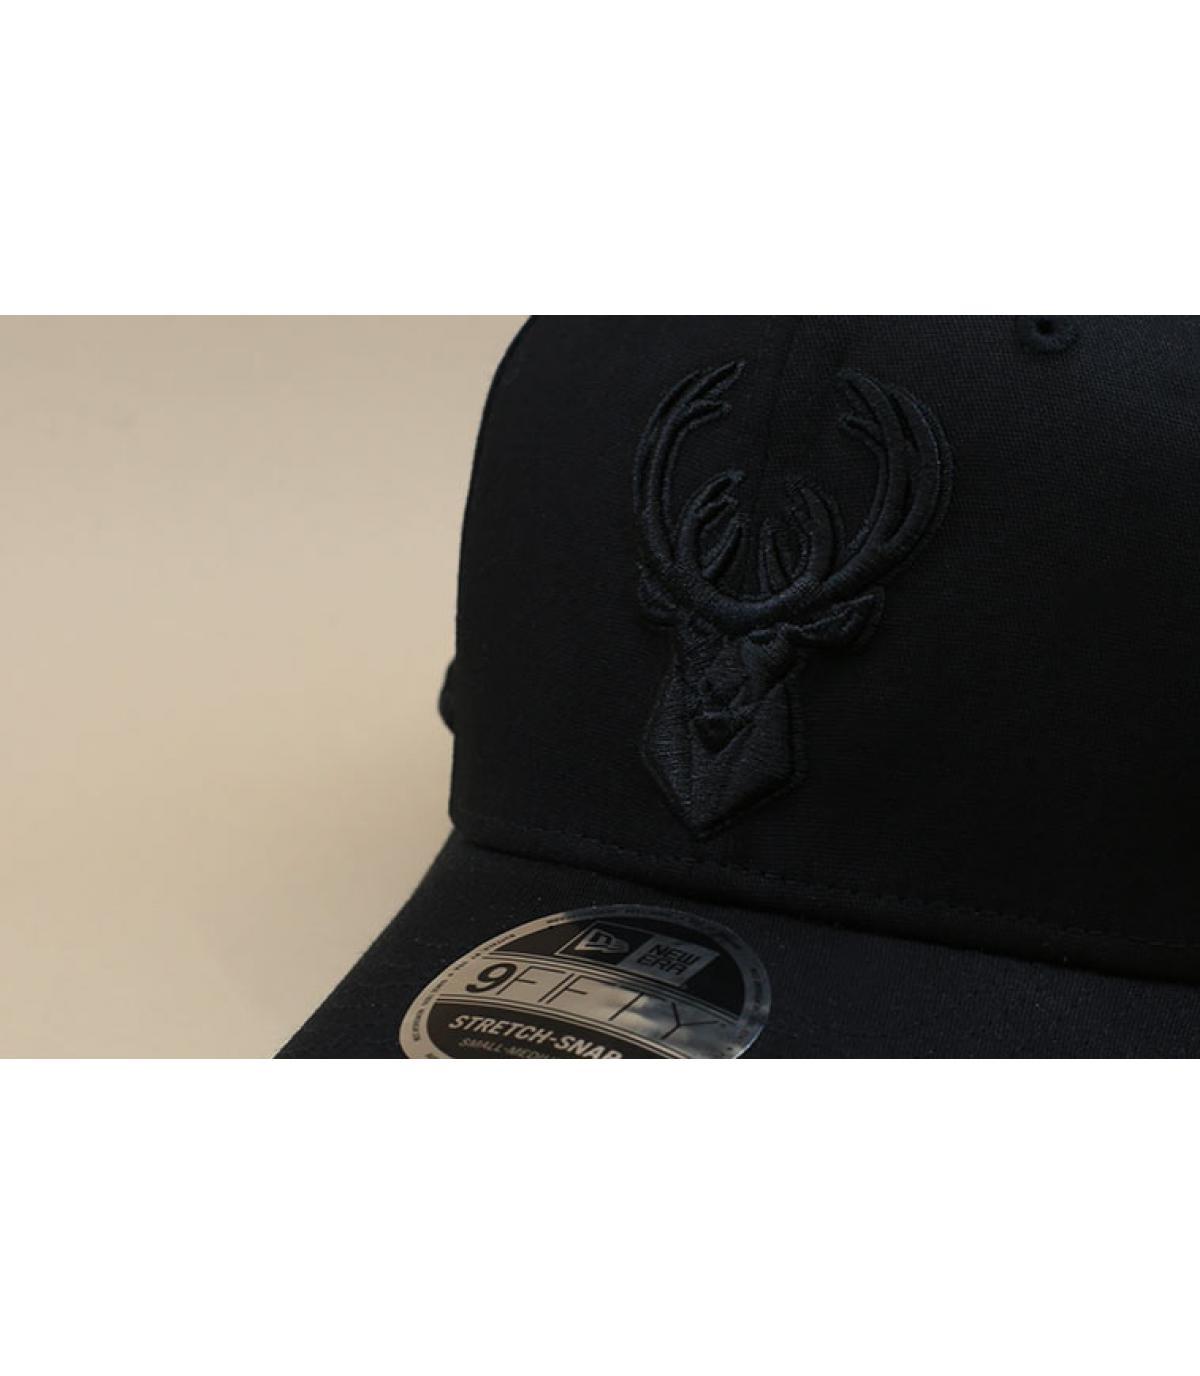 Details Tonal 950 Stretch Bucks - Abbildung 3